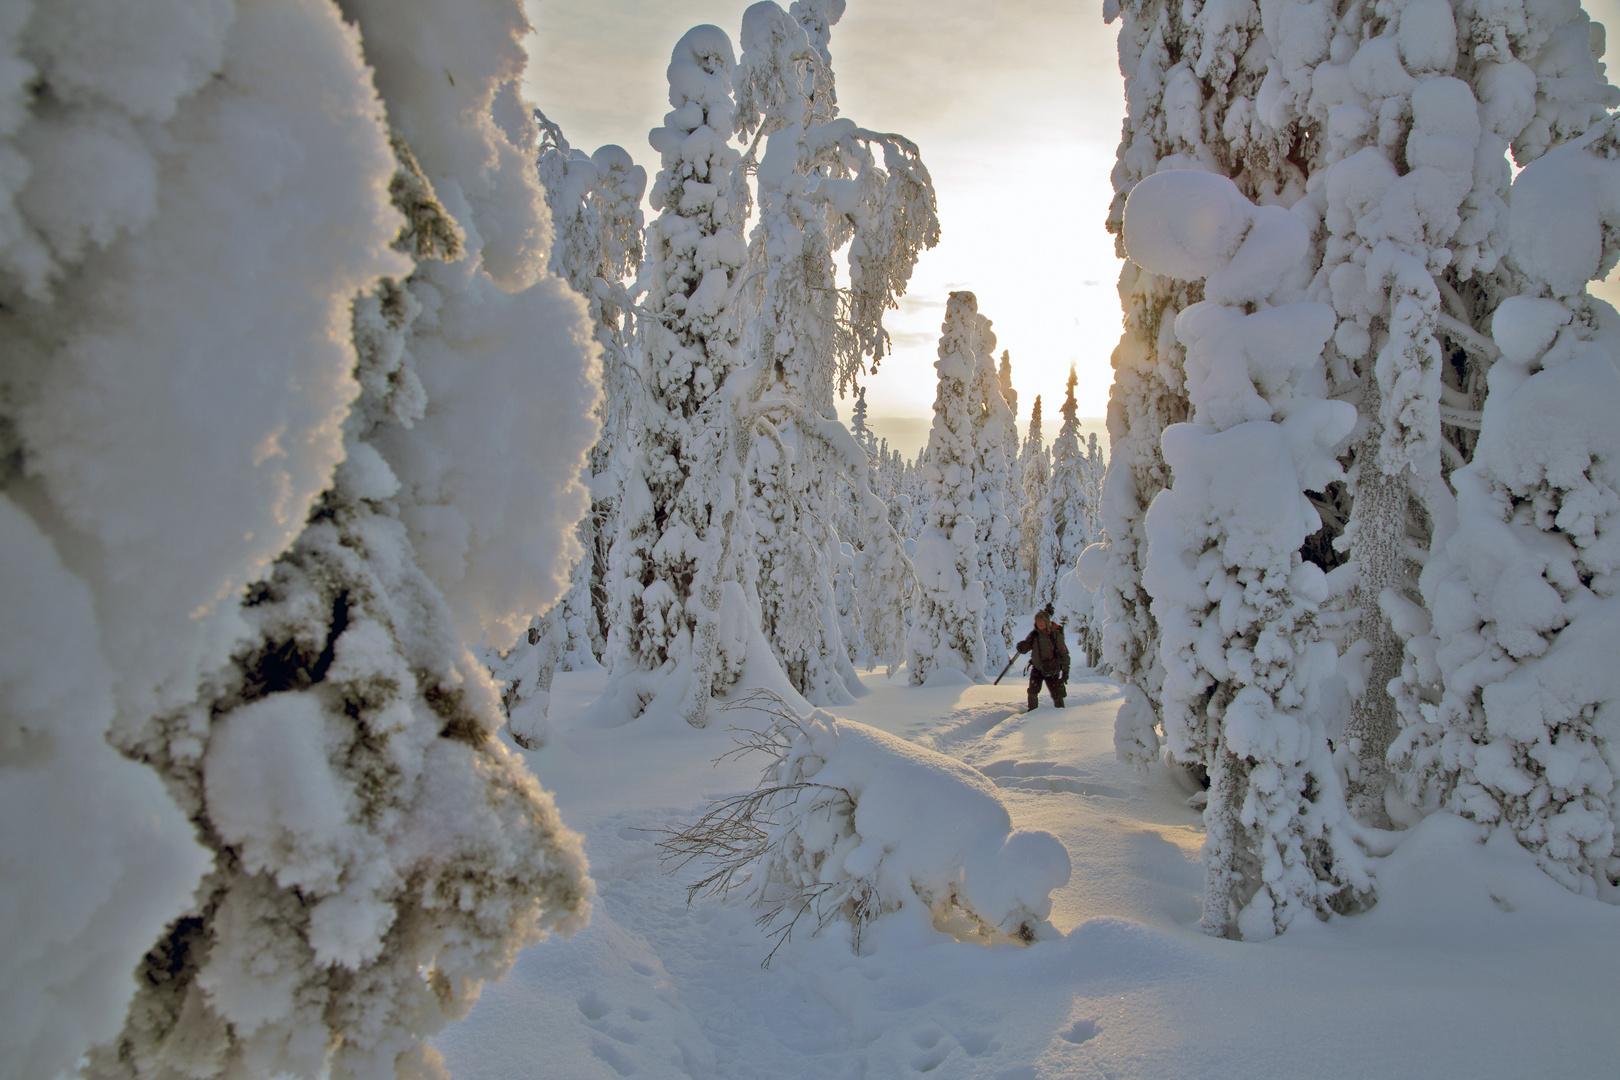 Letzter Gruß des Winters...